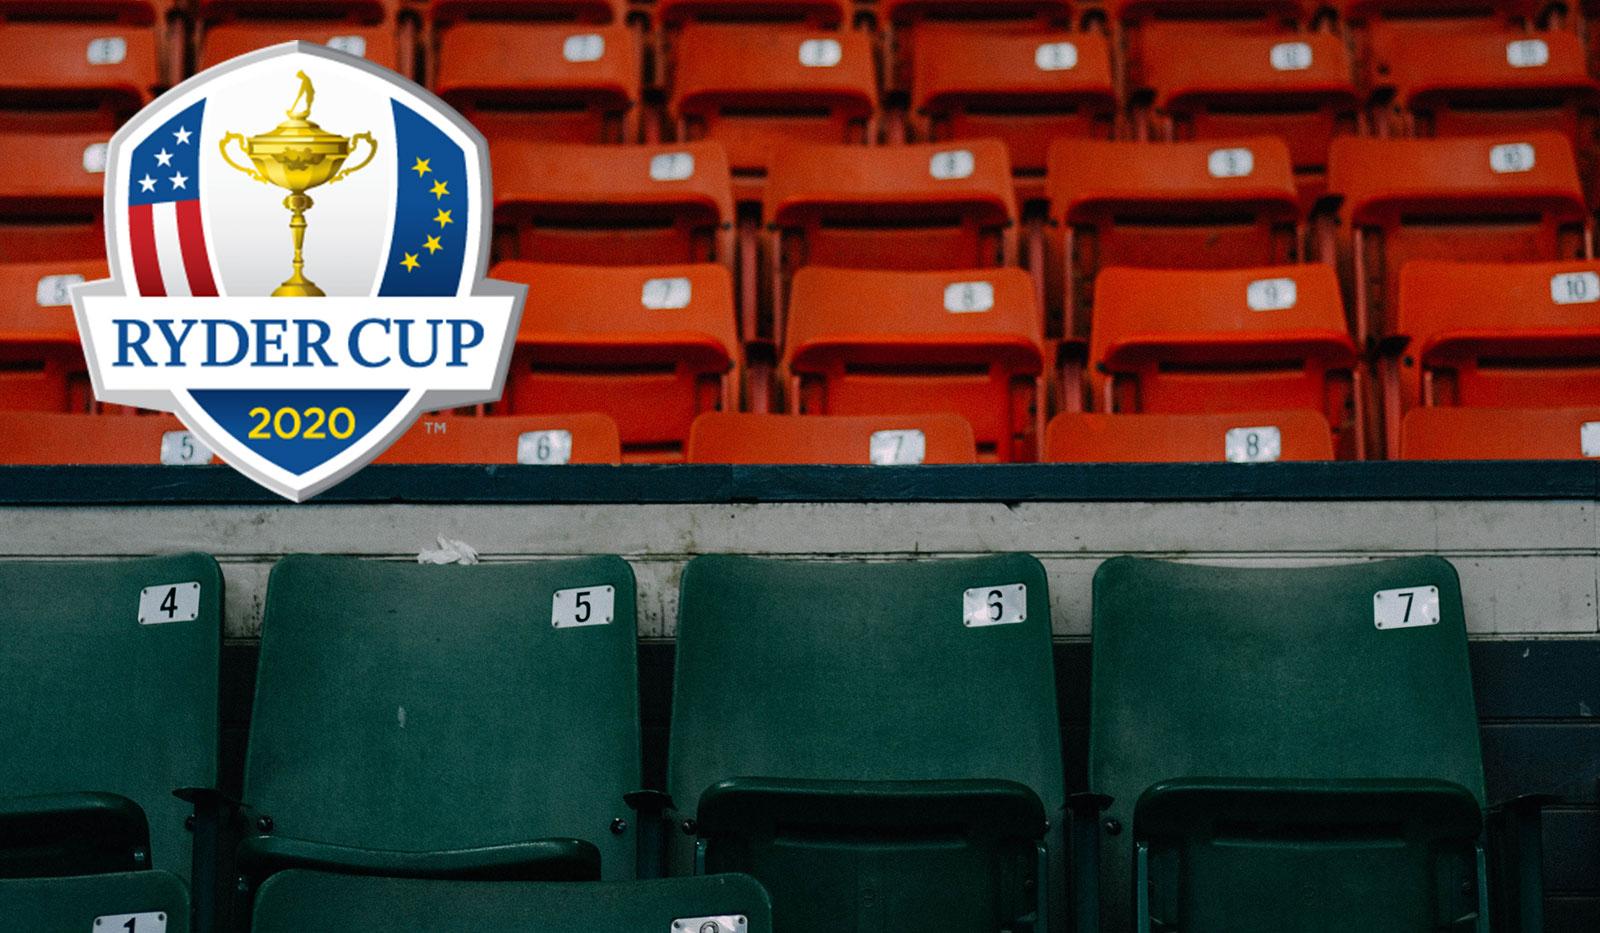 Leere Plätze, Ryder Cup Logo